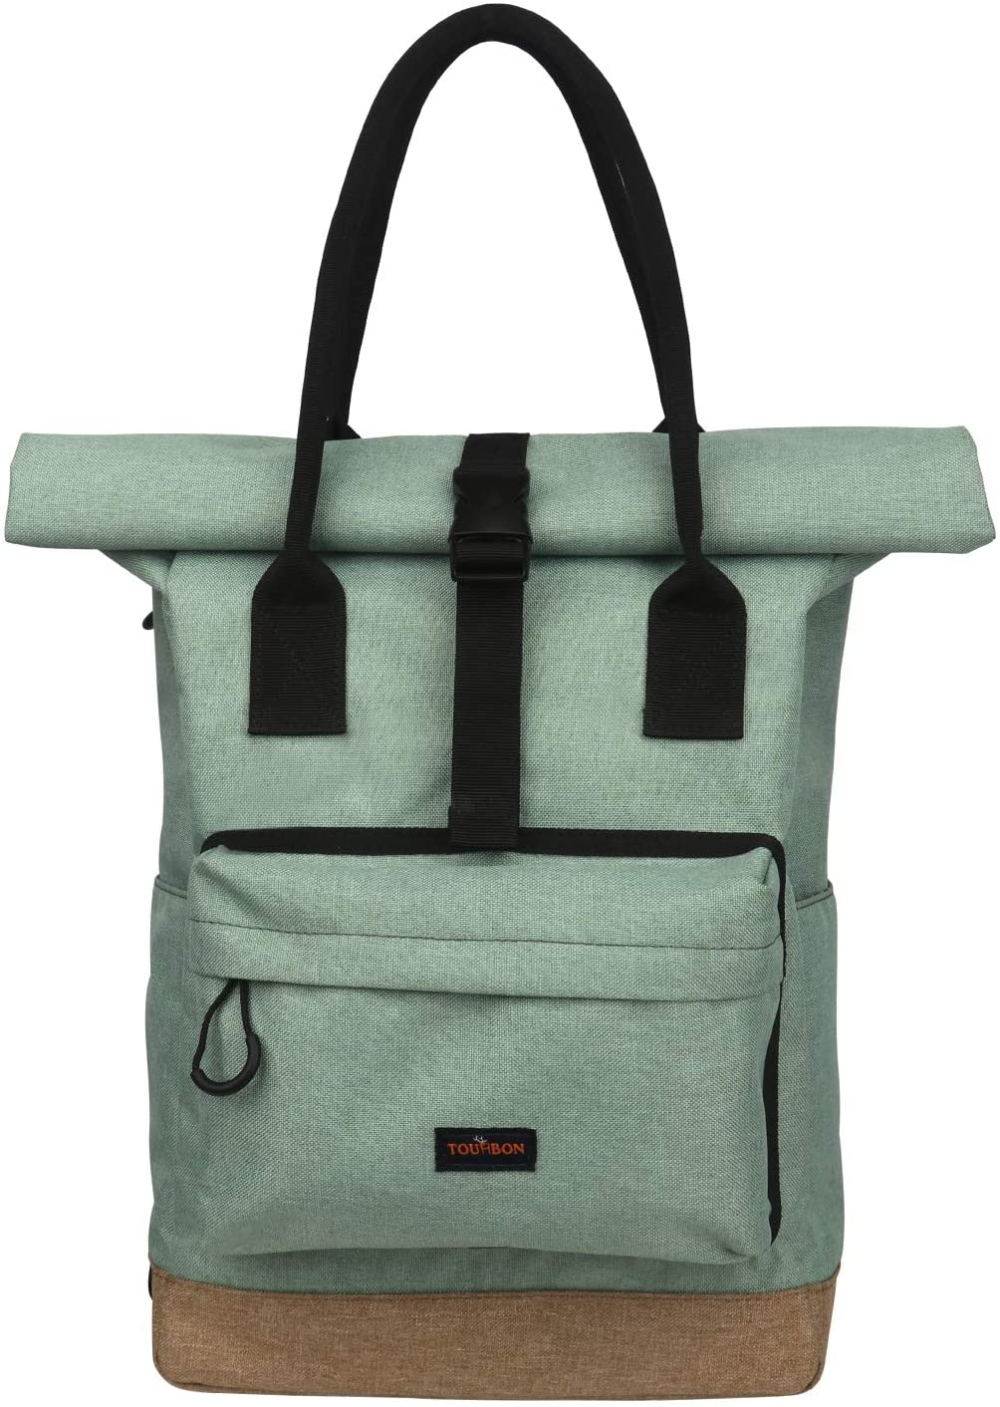 Tourbon Nylon Roll-Top Clip-on Market Shopper Sacoche V/élo Sac /À Dos /Épaule Tote Bag